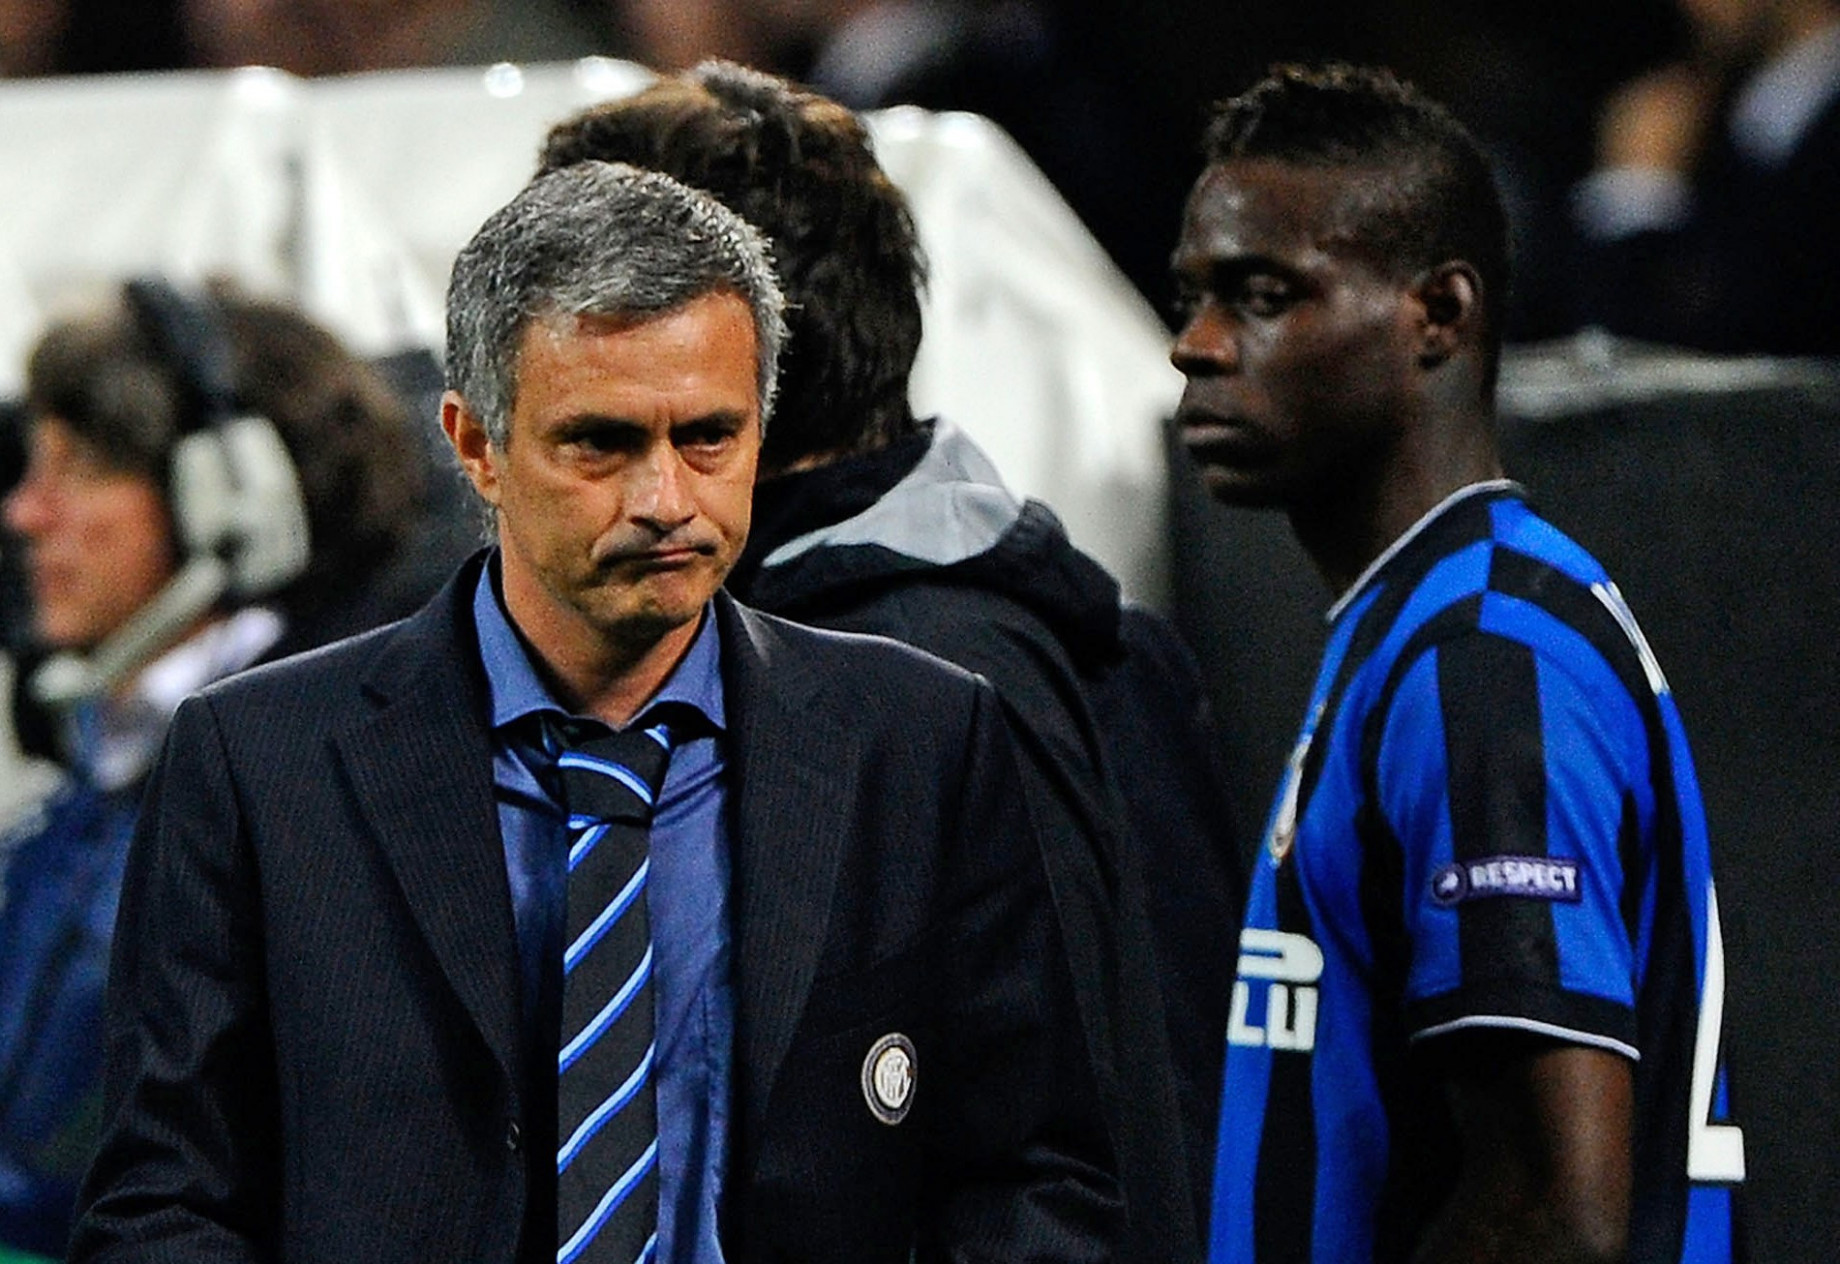 balotelli_mourinho_image_gallery_.jpg